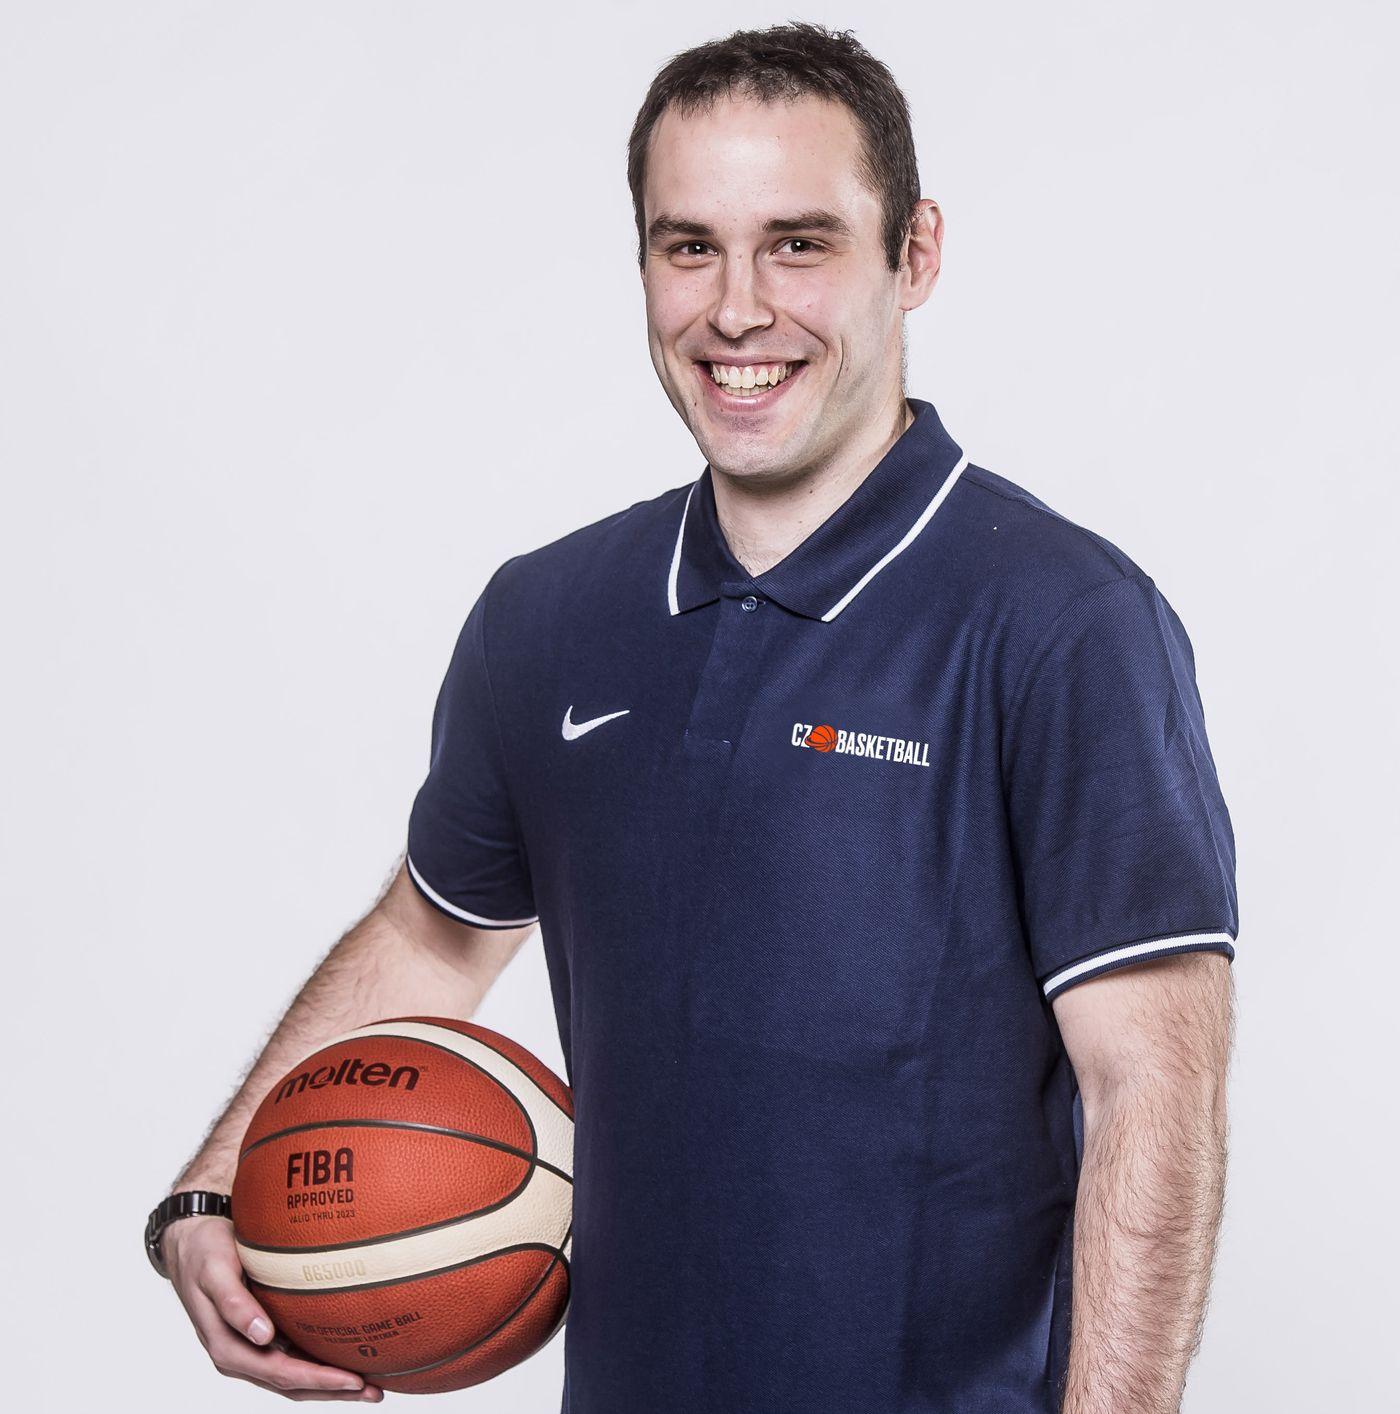 Martin Peterka Interview | Covid-19 basketbal | Sportbiz